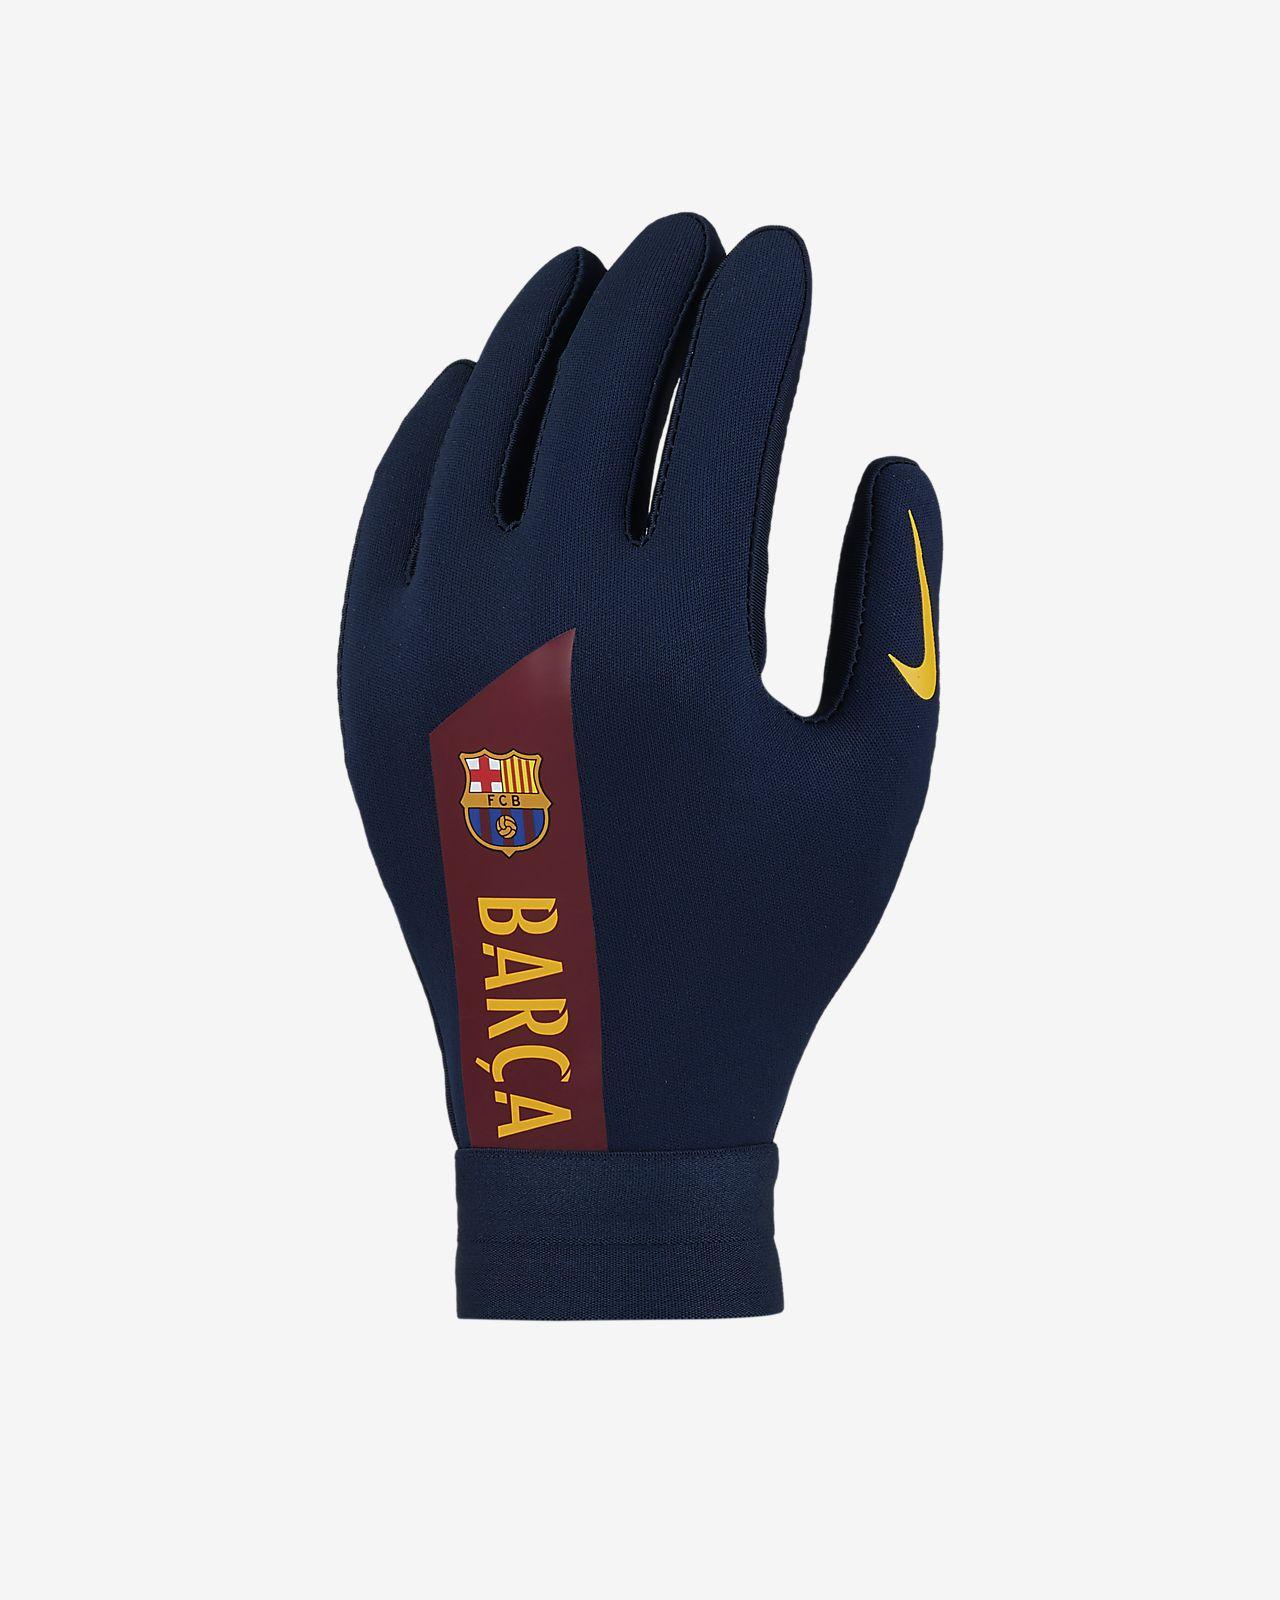 e434c371ad3e3 Nike HyperWarm FC Barcelona Academy Guantes de fútbol - Niño a. Nike ...